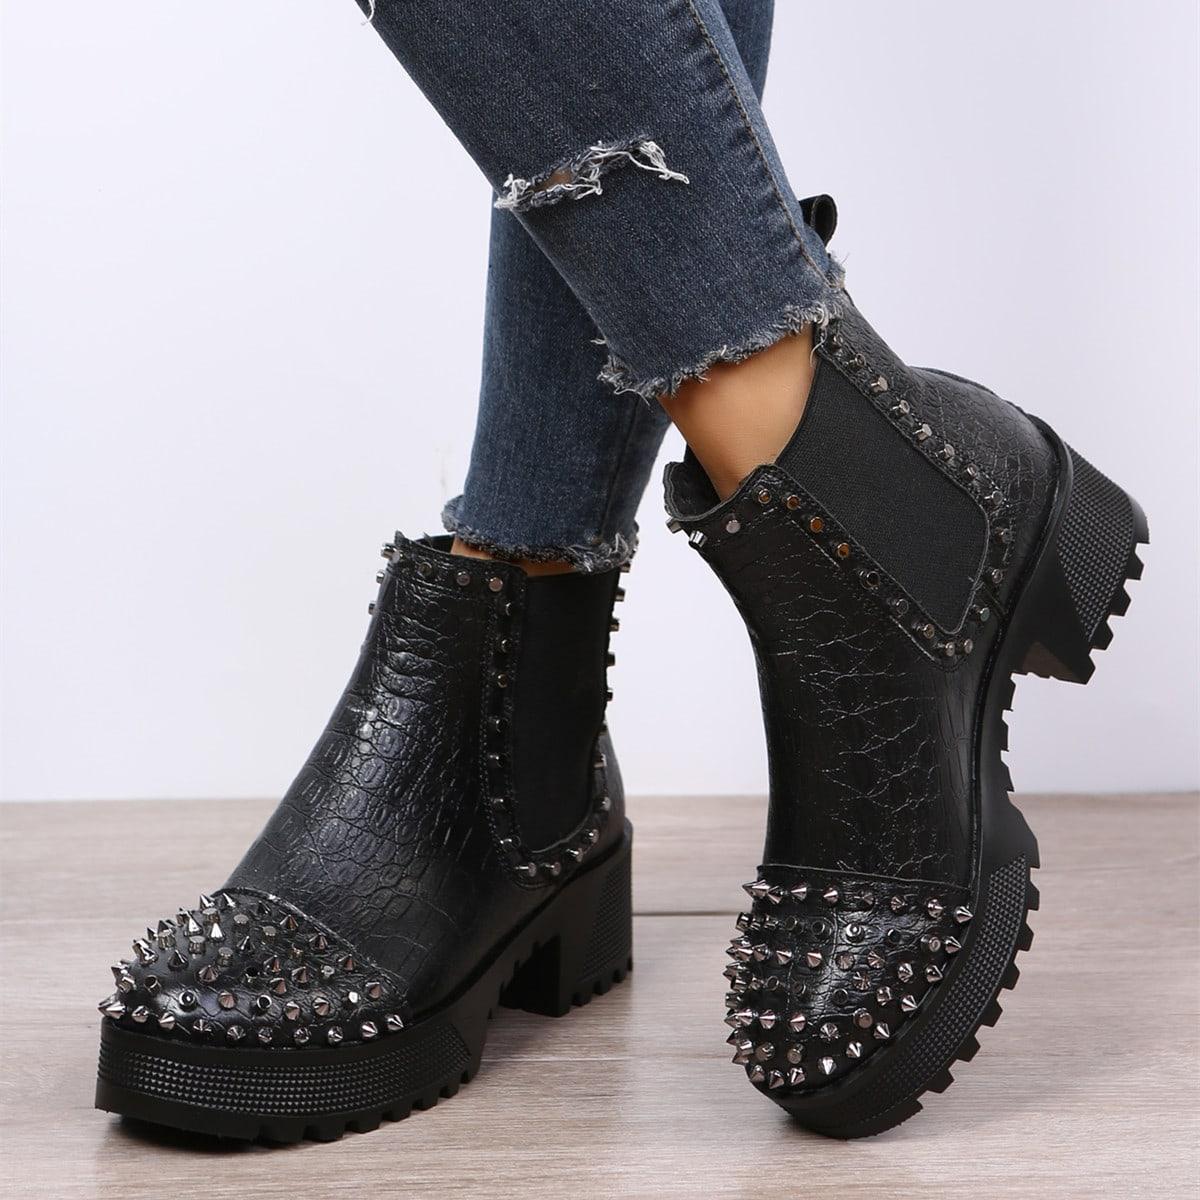 Studded Decor Crocodile Embossed Chelsea Boots